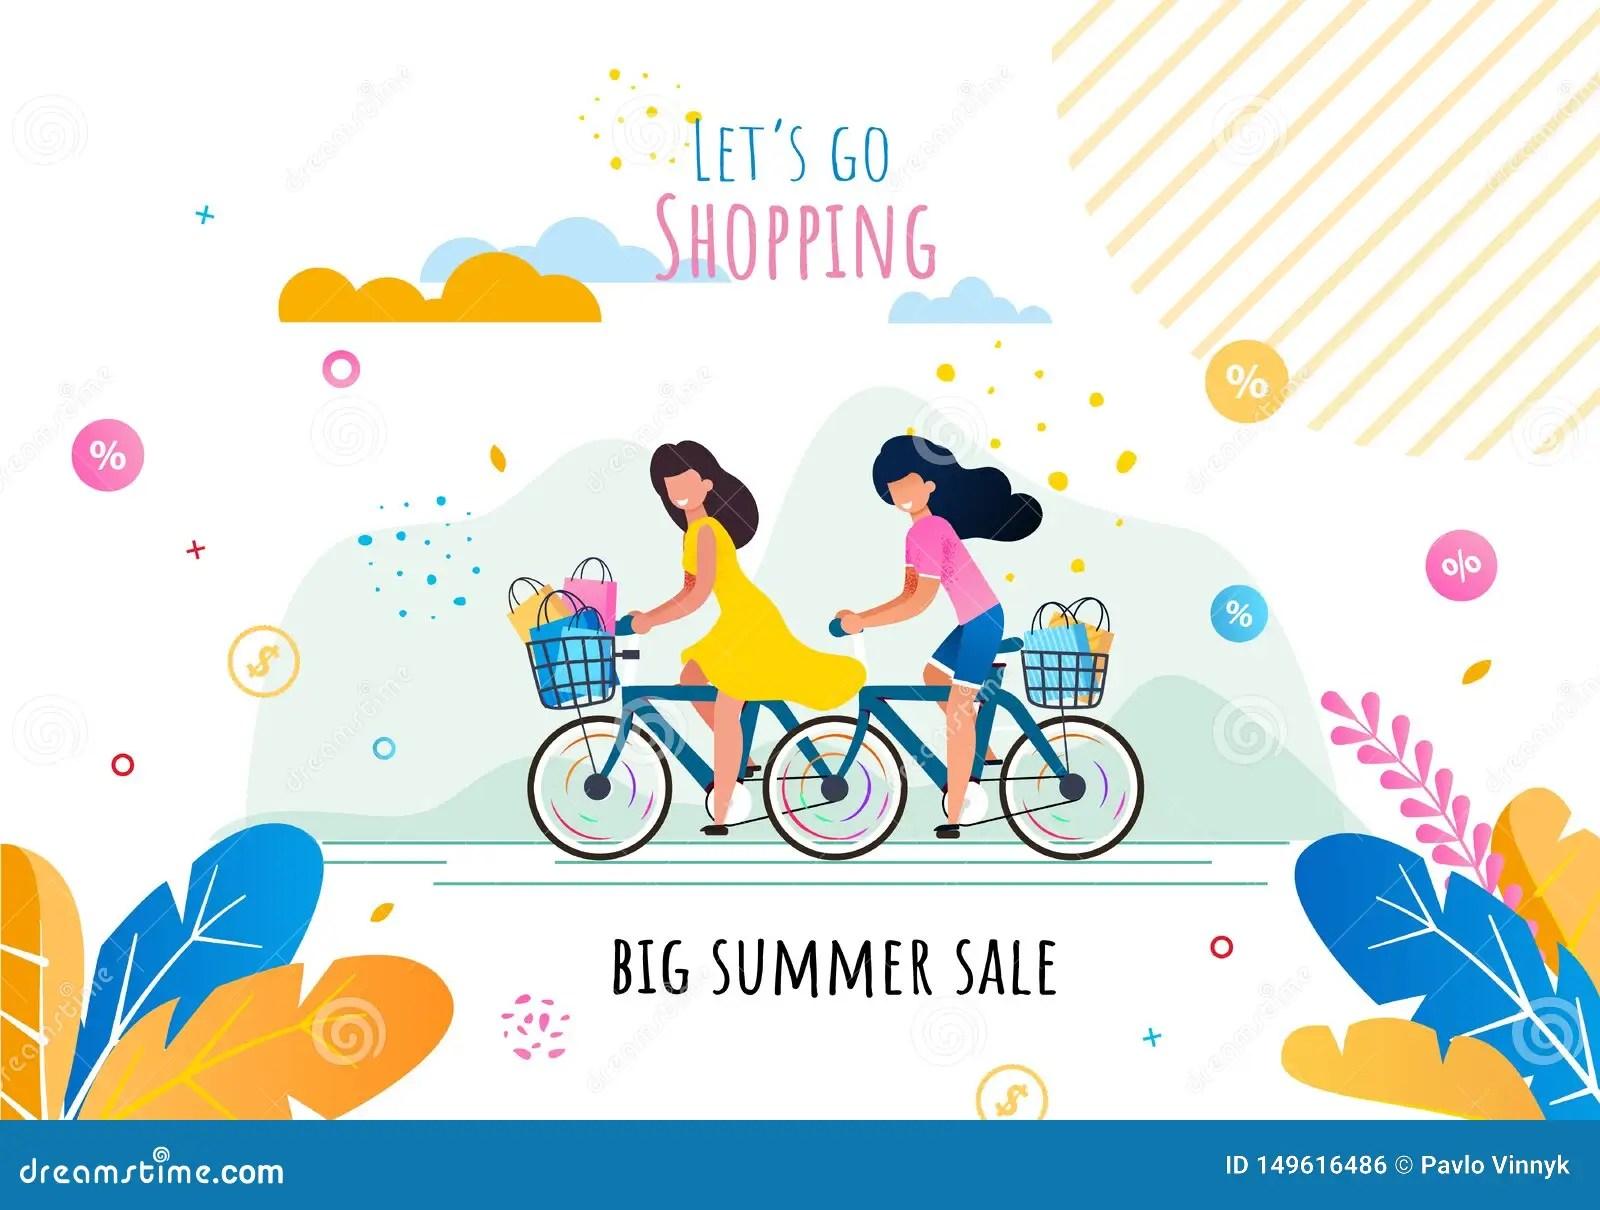 Lets Go Shopping On Summer Sale Motivation Banner Stock